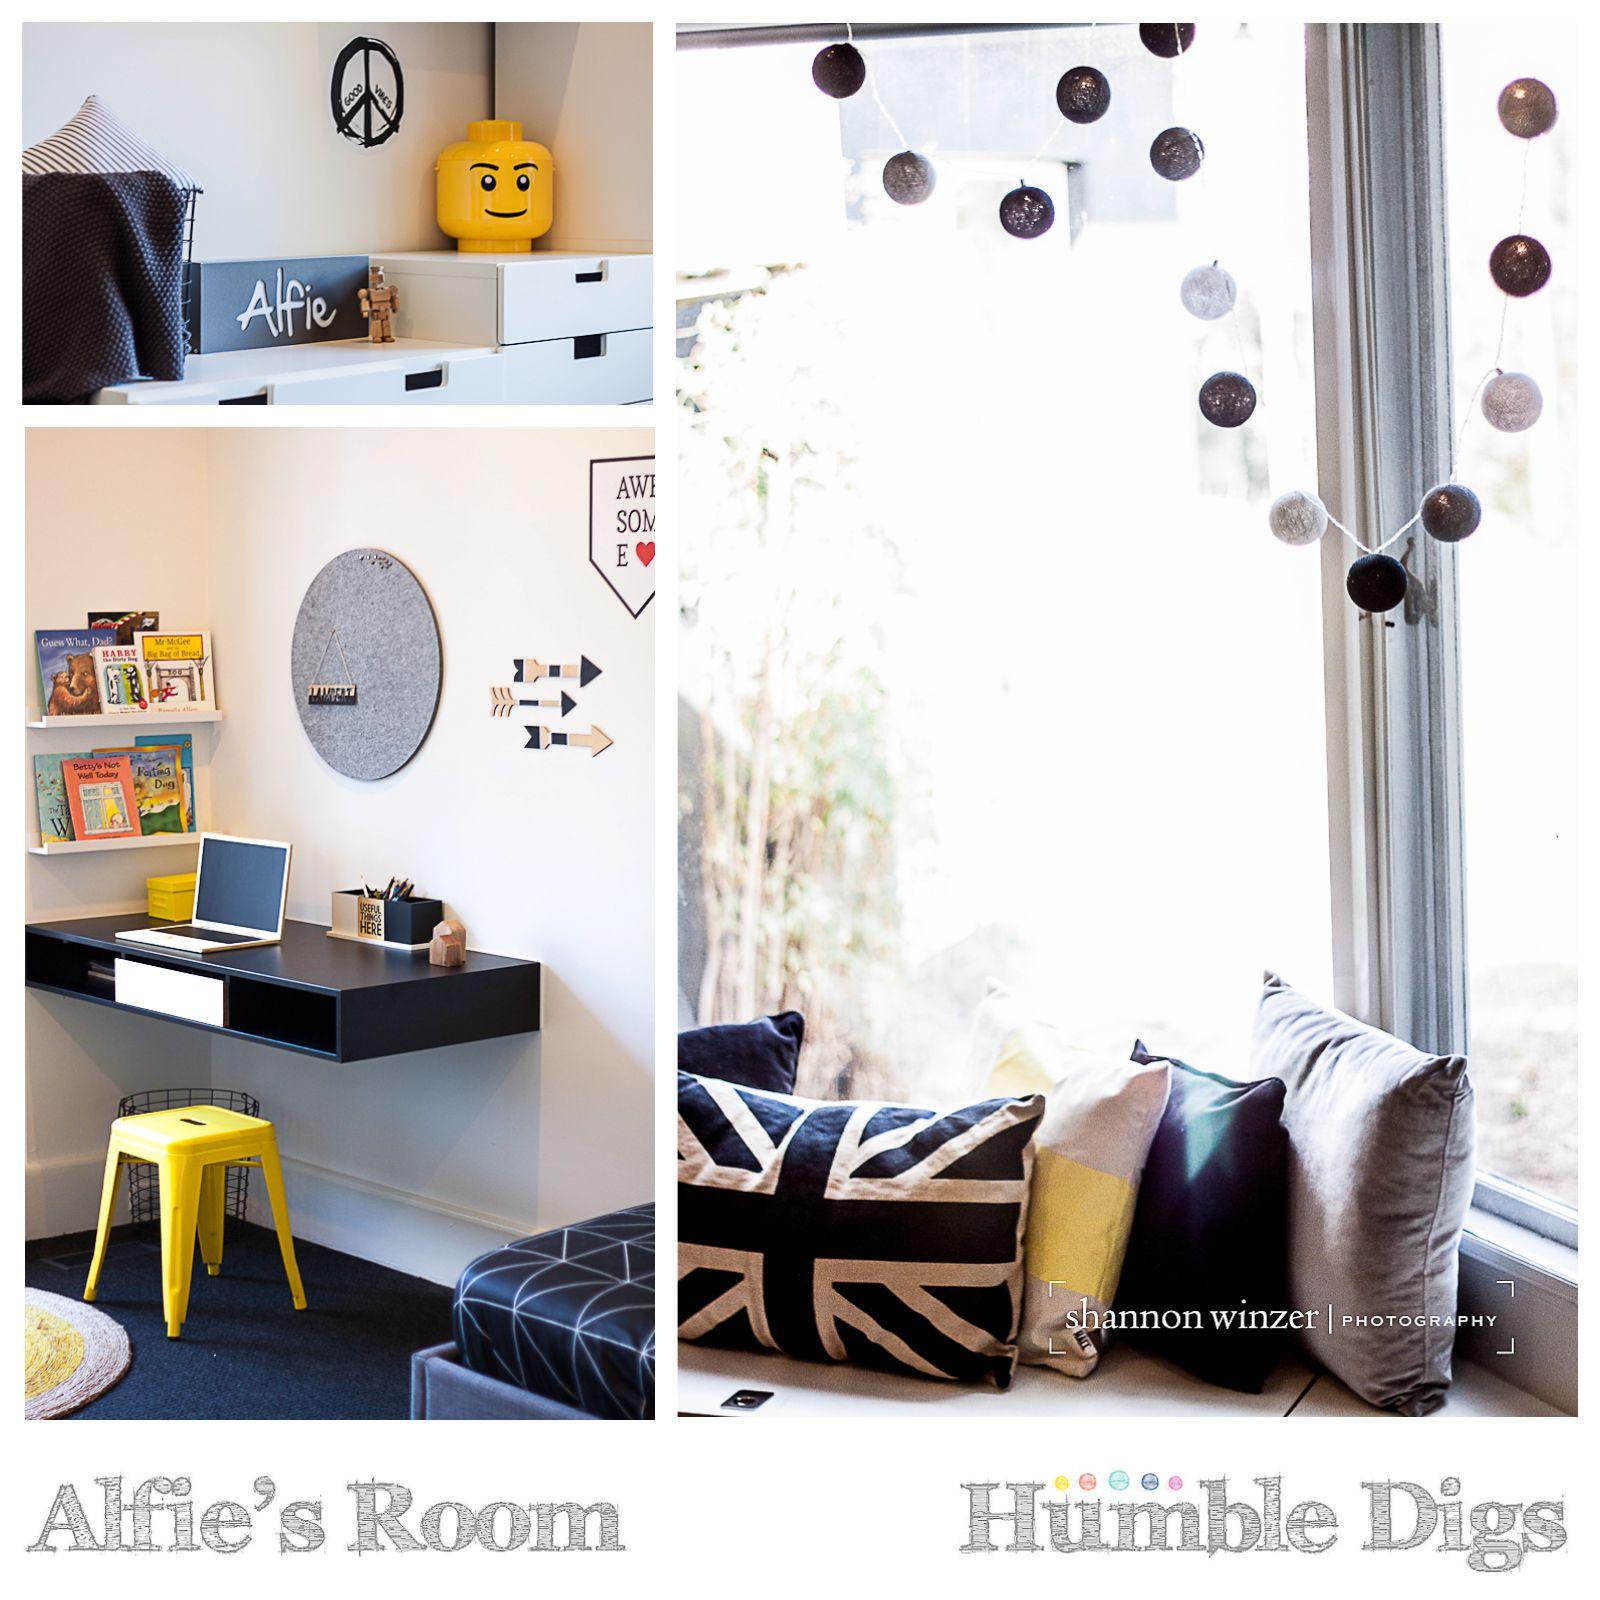 Kids Bedroom For Boys Alfies Room Kids Room Boys Room Tween Room Monochrome Room